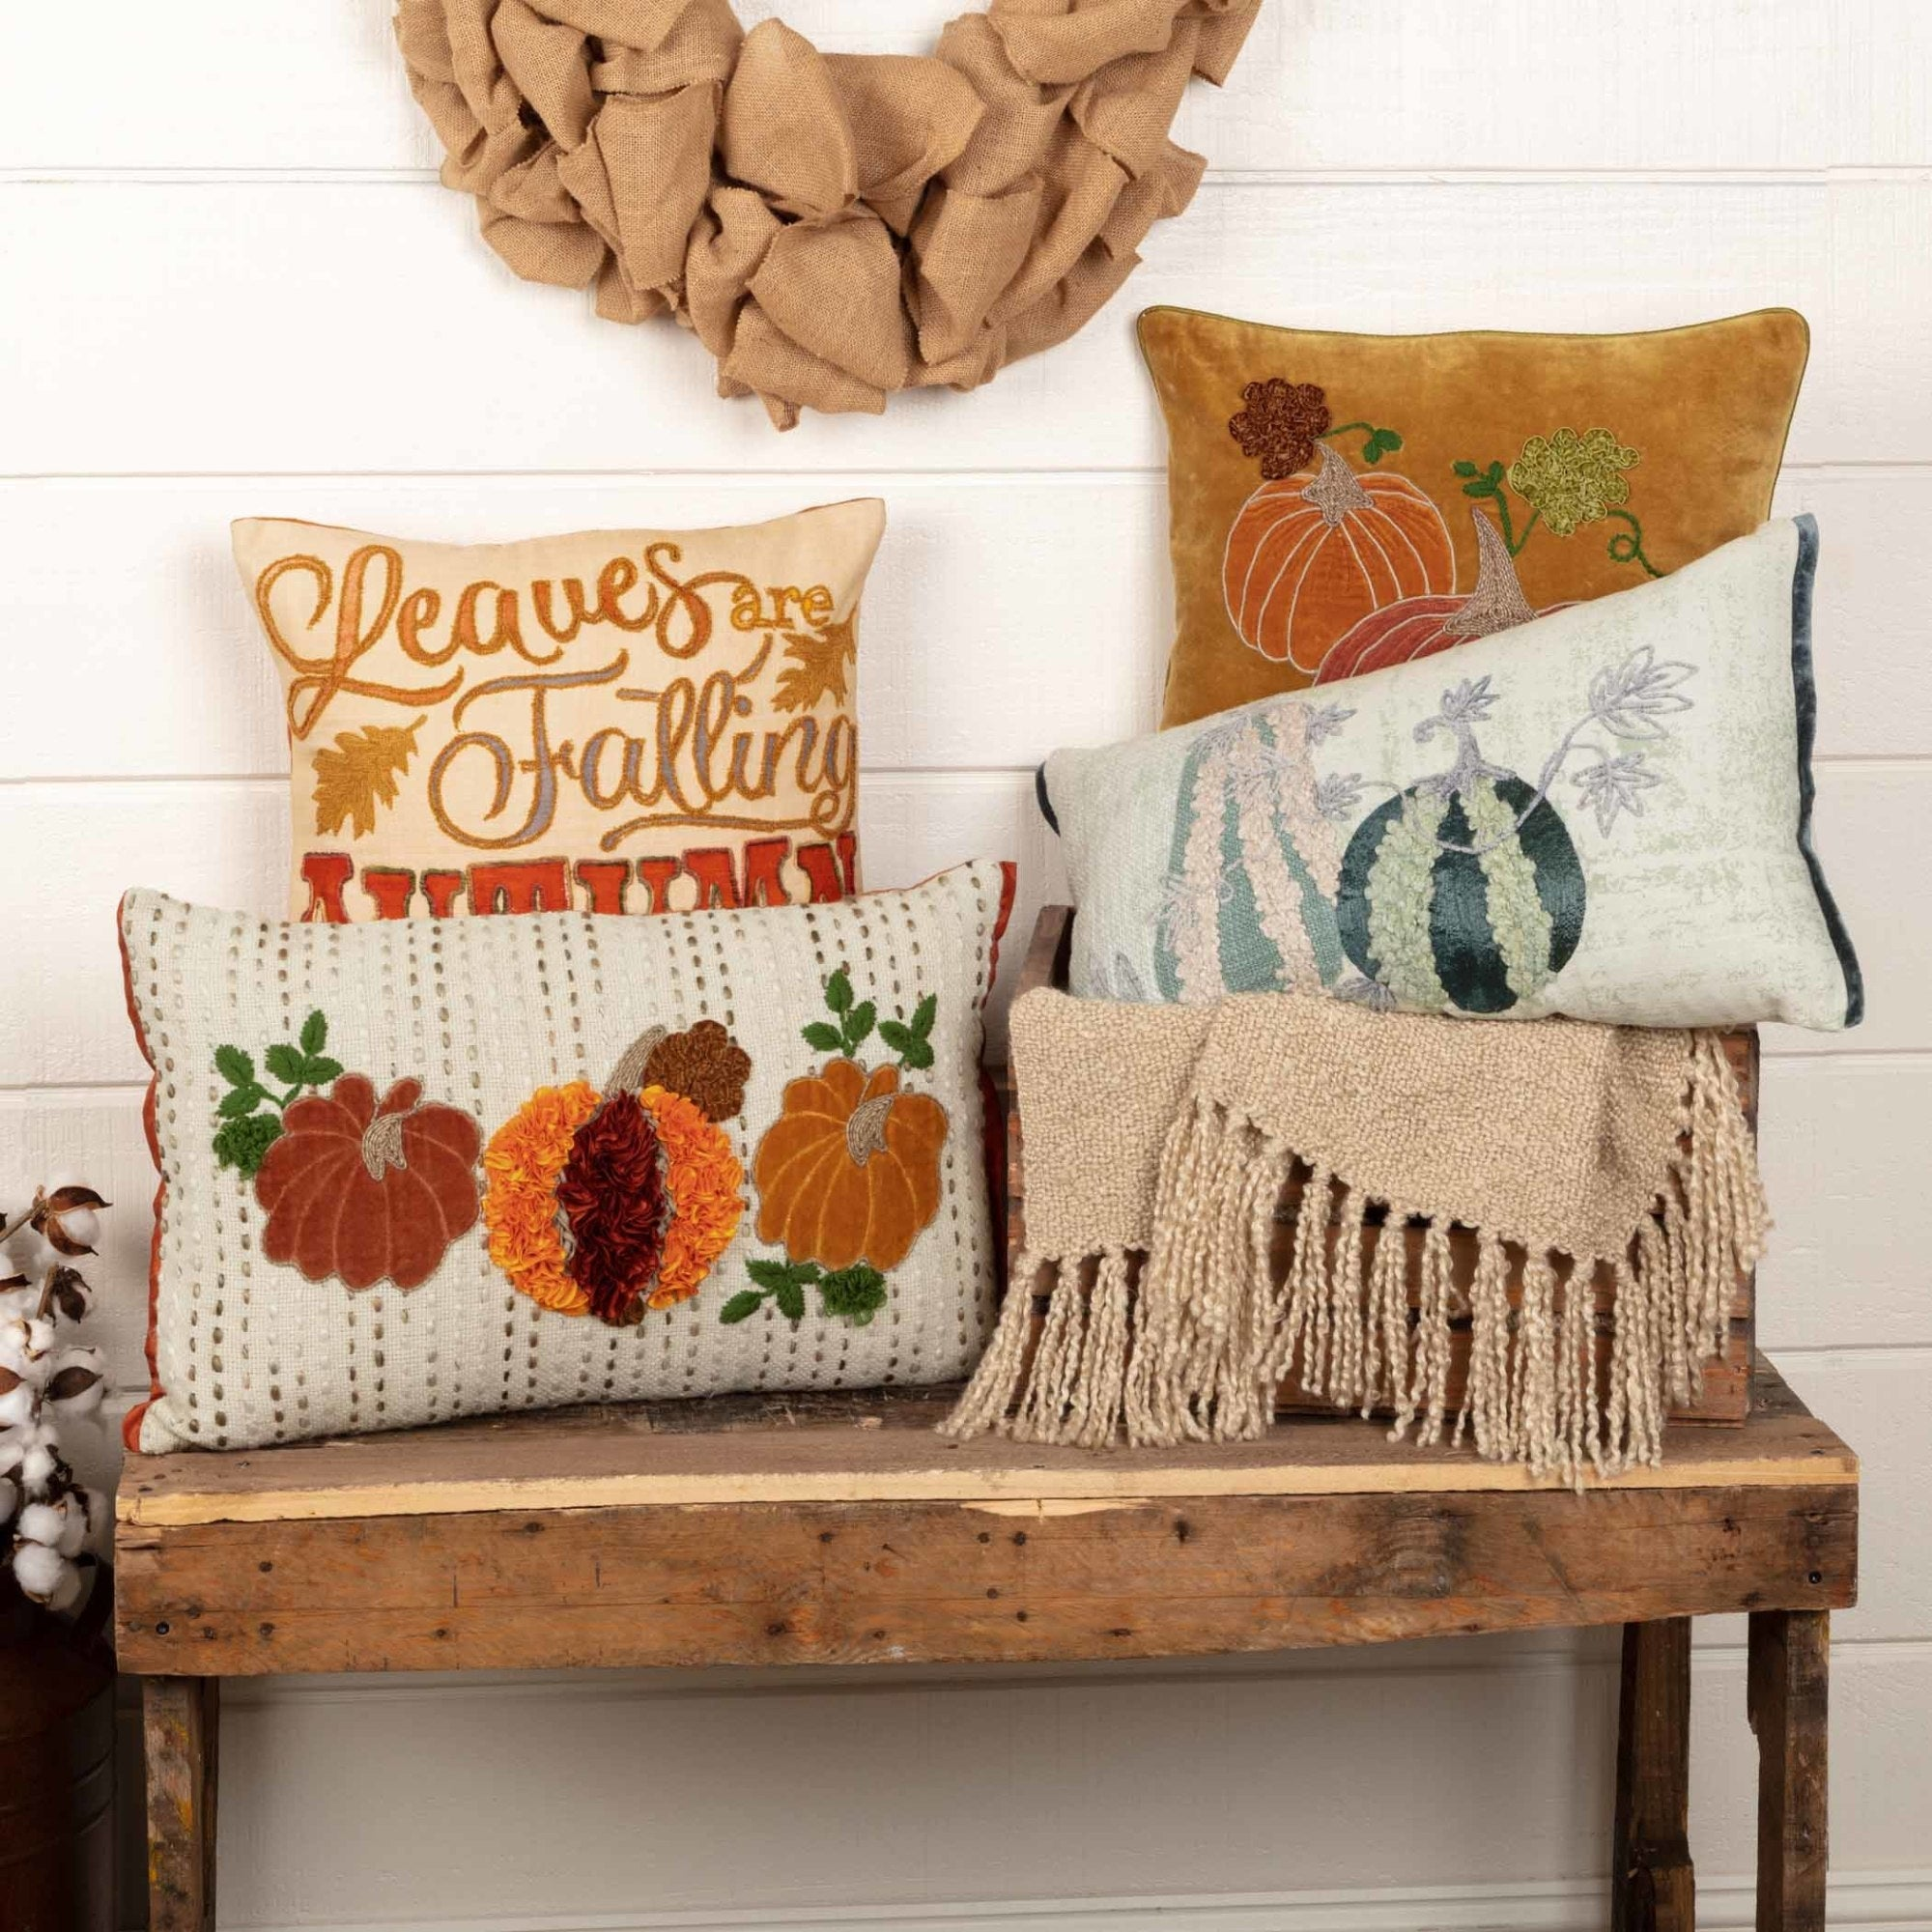 Home Decor Insert Vhc Brands Decorative Throw Pillow Couch Autumn Calling 18x18 Cover Home Furniture Diy Tohoku Morinagamilk Co Jp